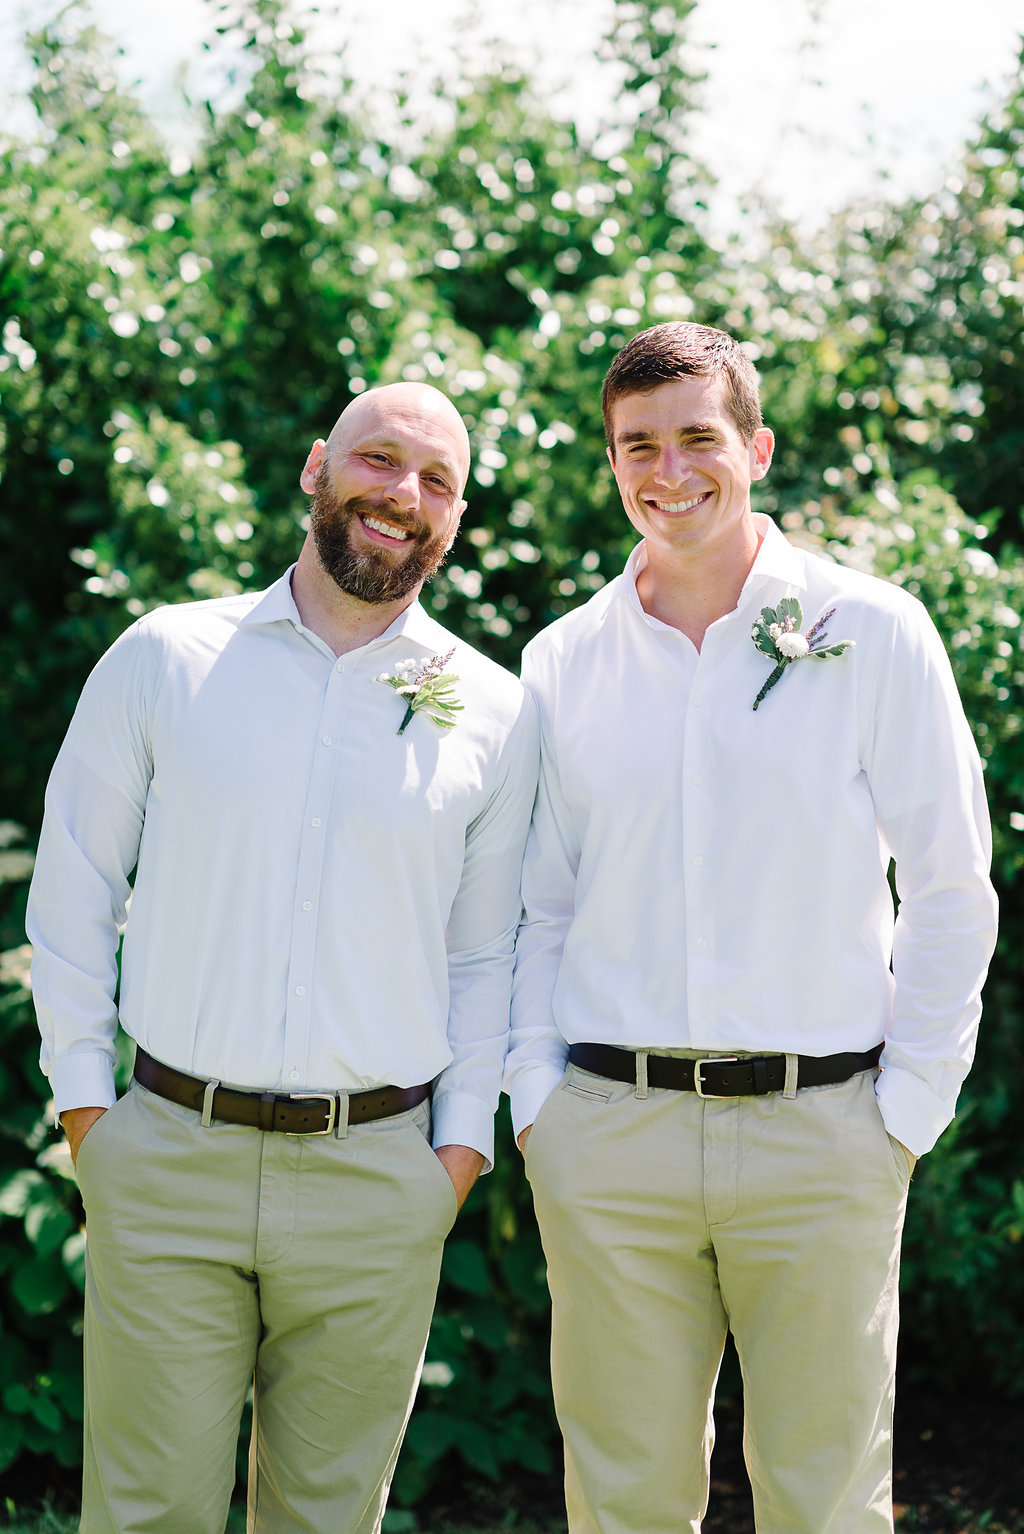 NormanPhotoPaper_PondMcPhersonPituch_Wedding-146.jpg